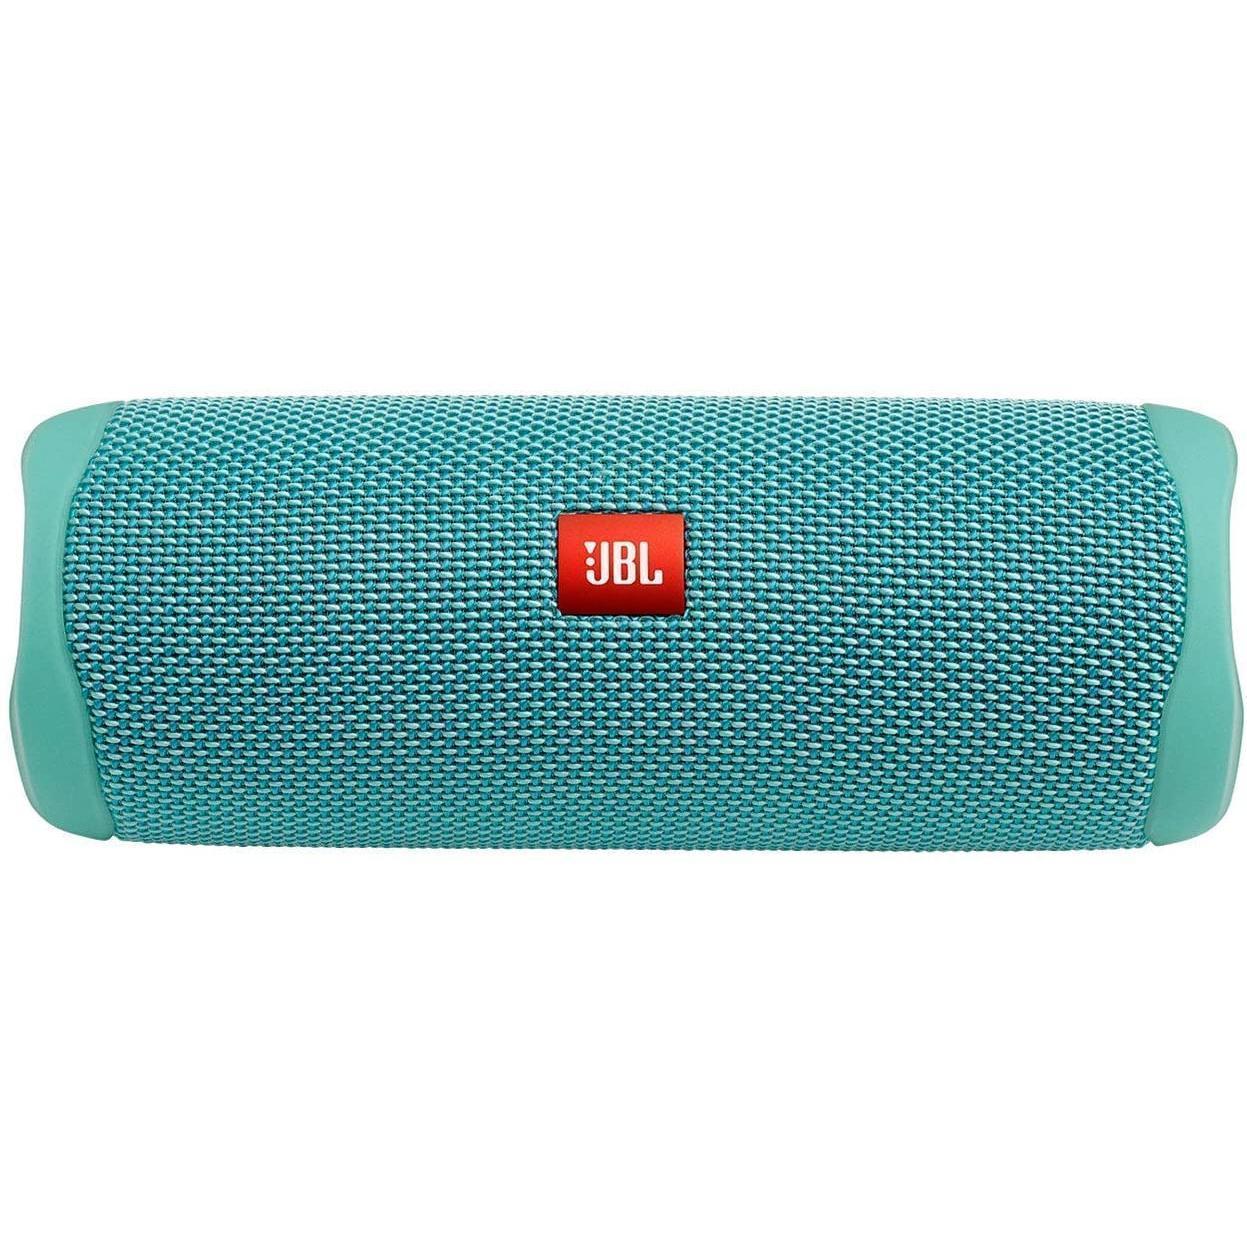 Speaker Bluetooth JBL Flip 5 - Teal